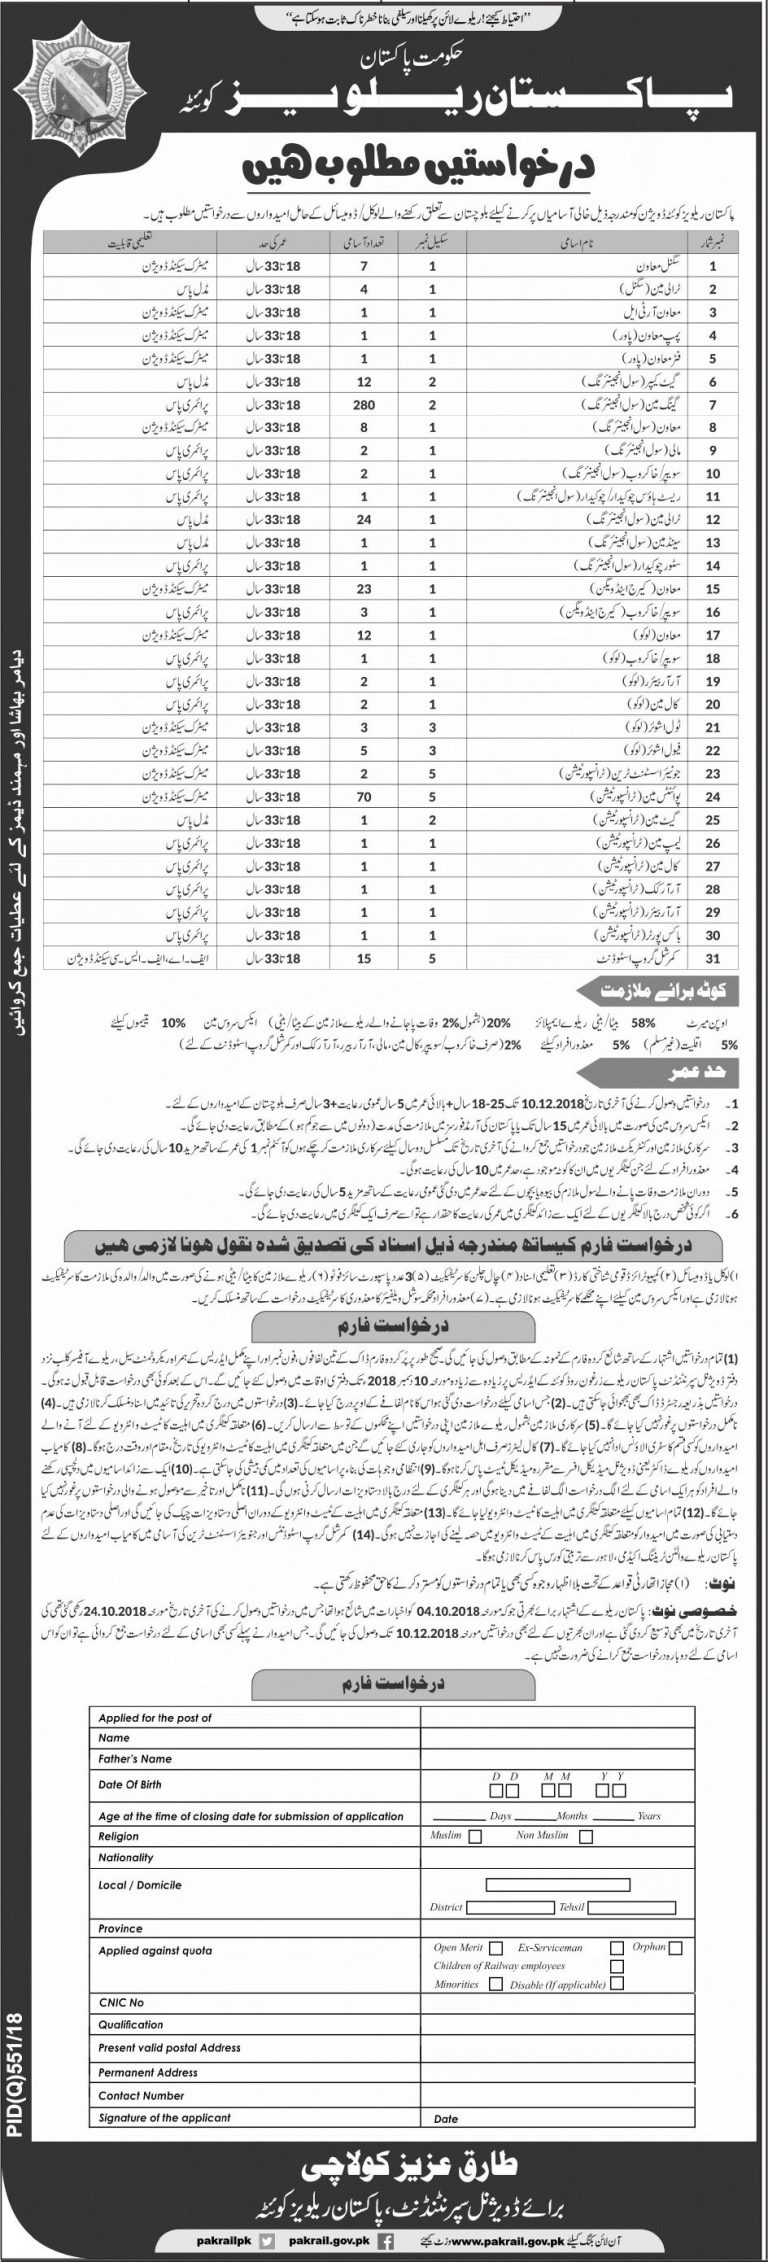 Pakistan Railway Jobs 2018 Quetta Division Application Form Last date